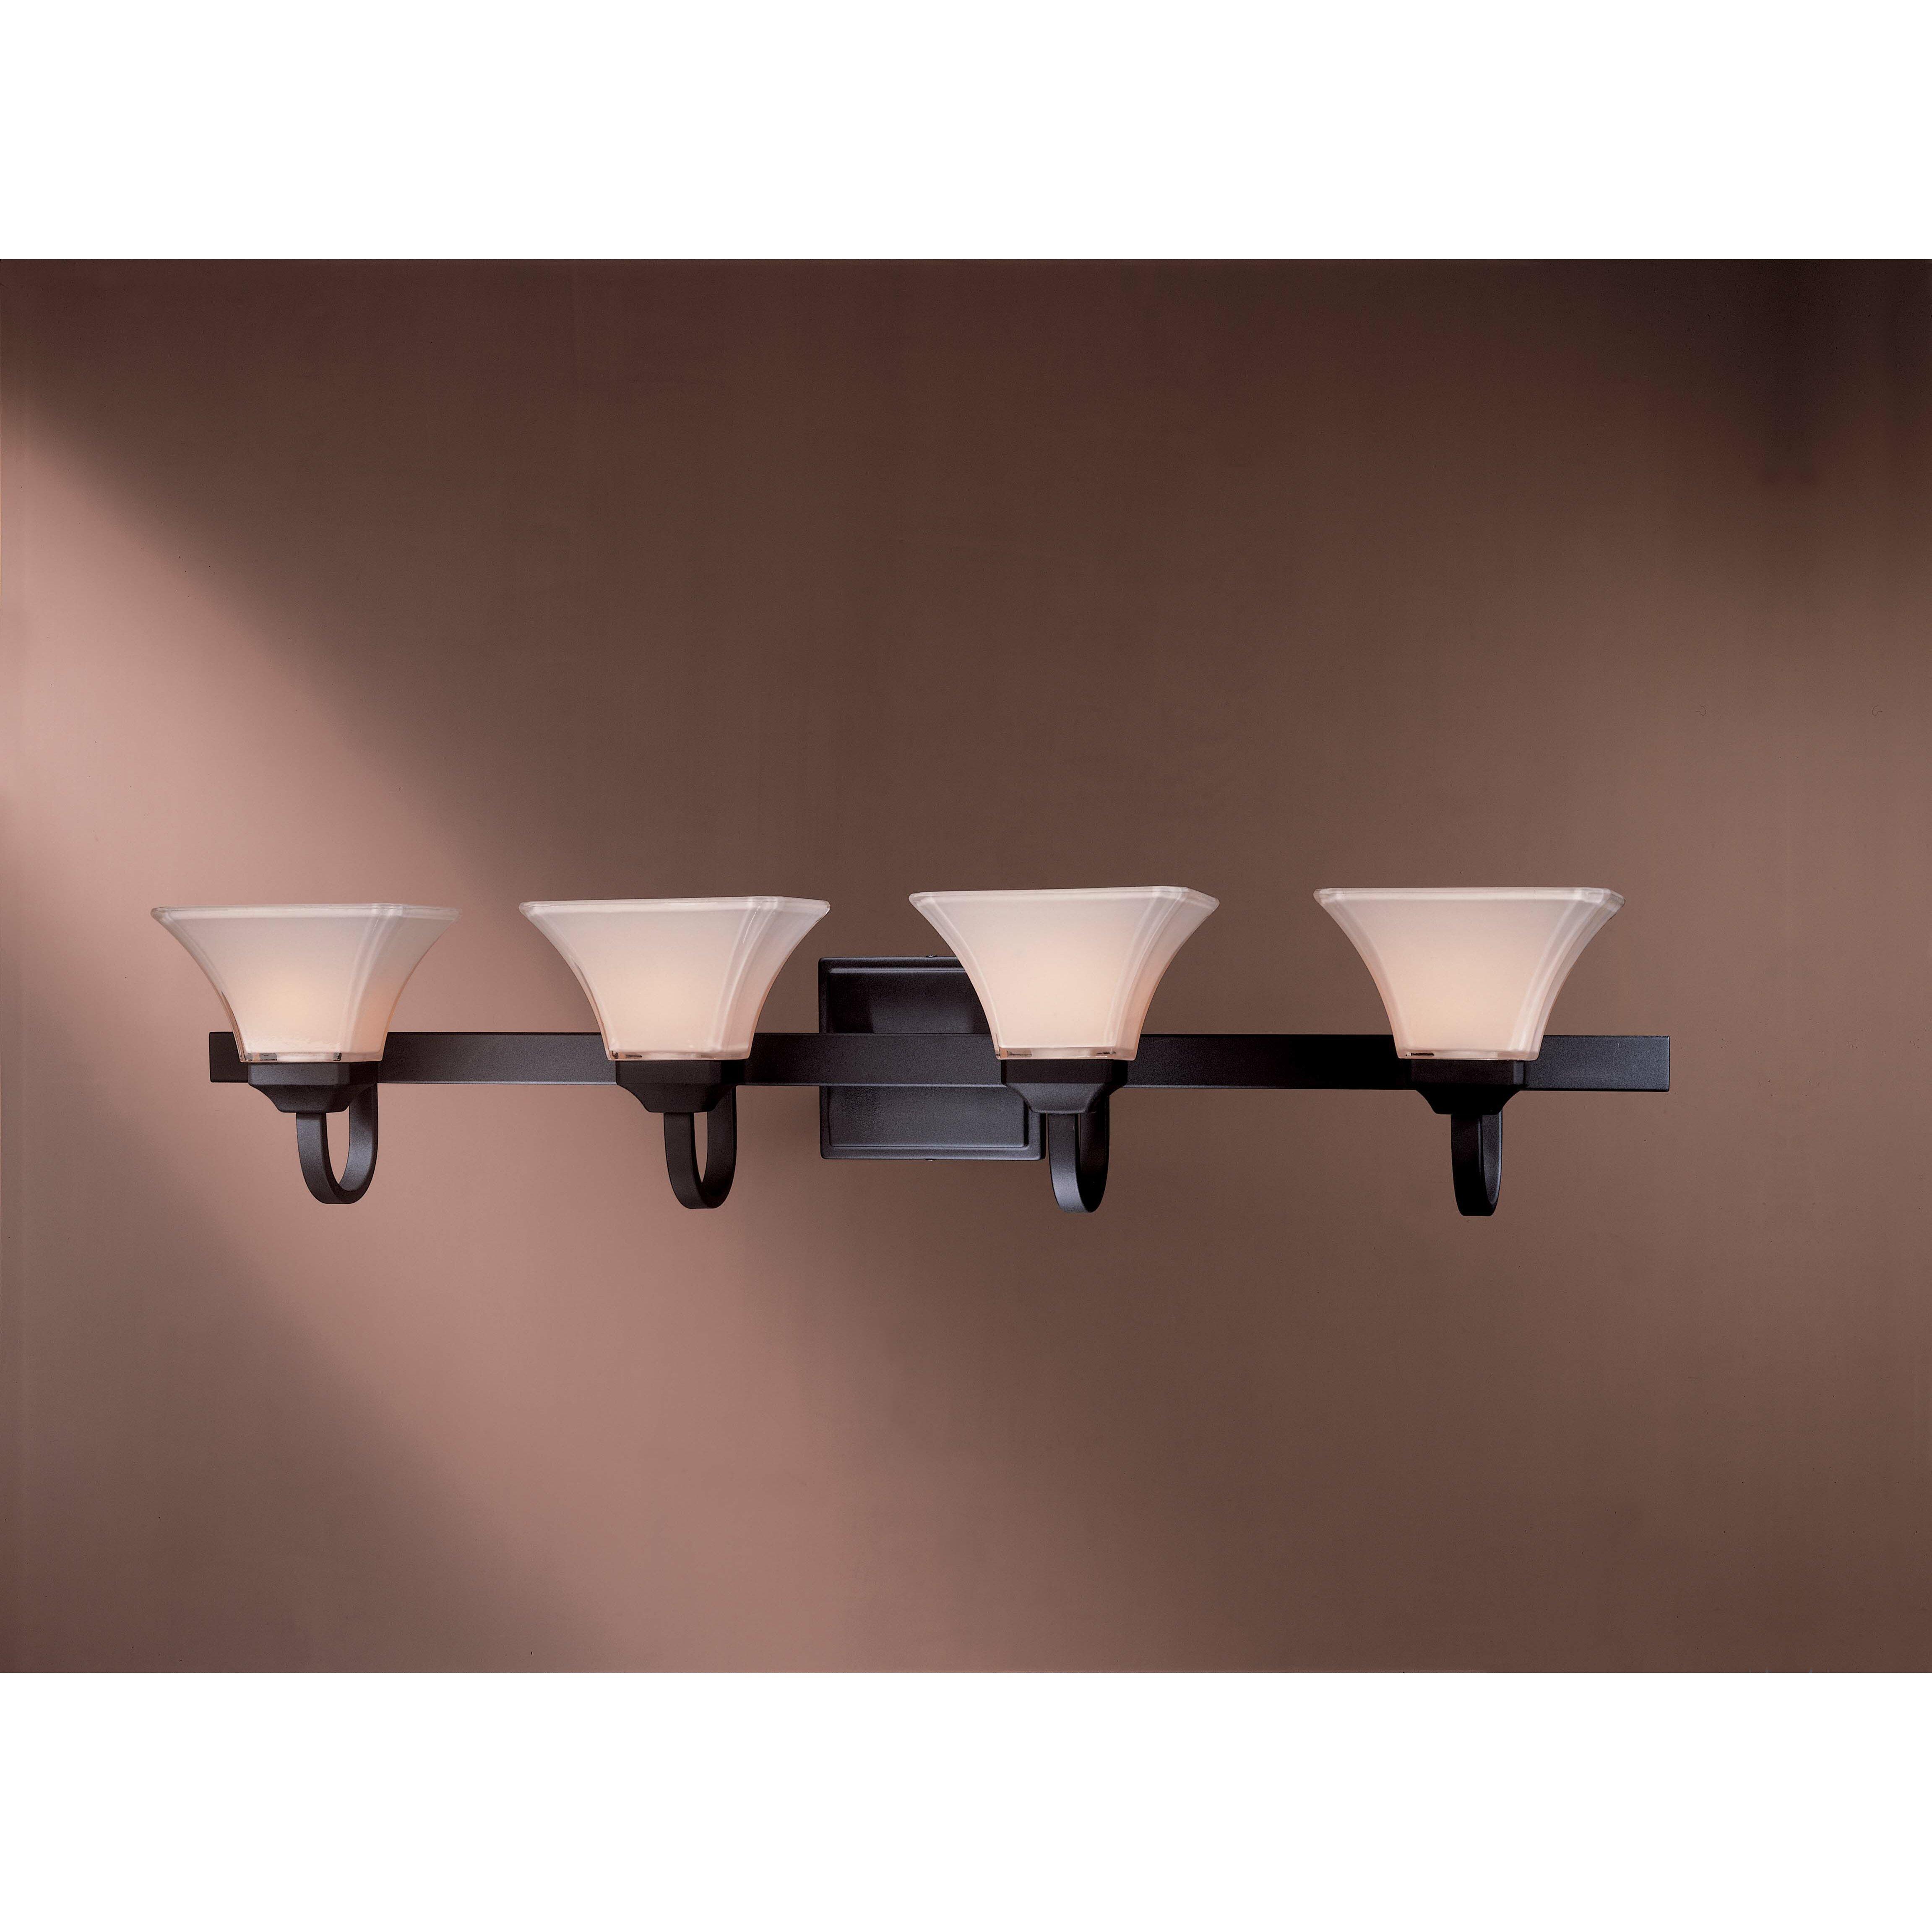 lights traditional bathroom vanity lighting minka lavery sku. Black Bedroom Furniture Sets. Home Design Ideas